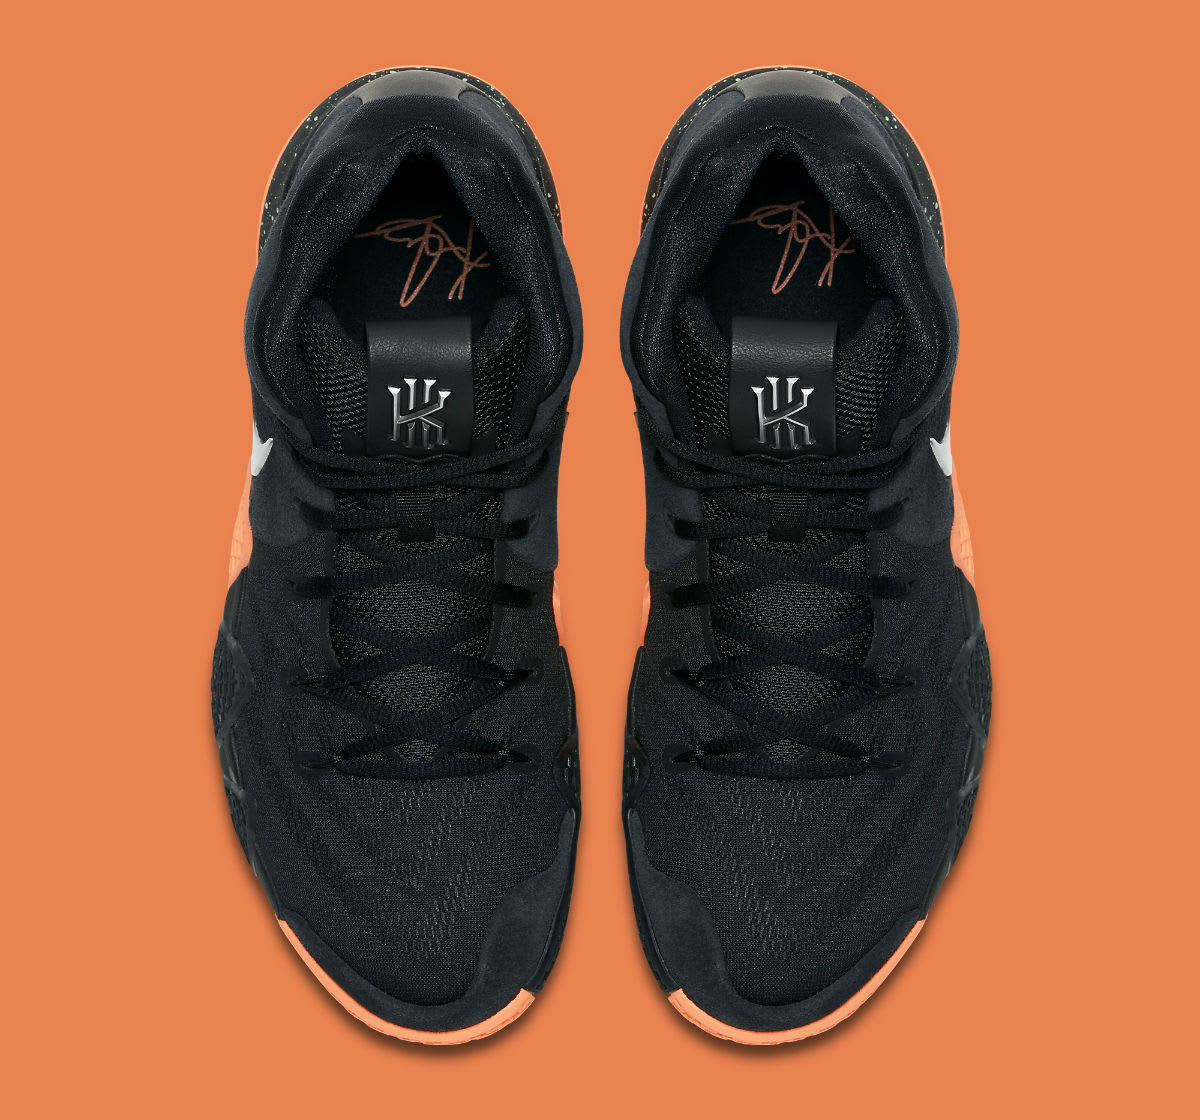 Nike Kyrie 4 Black/Silver-Orange Release Date 943806-010 Top